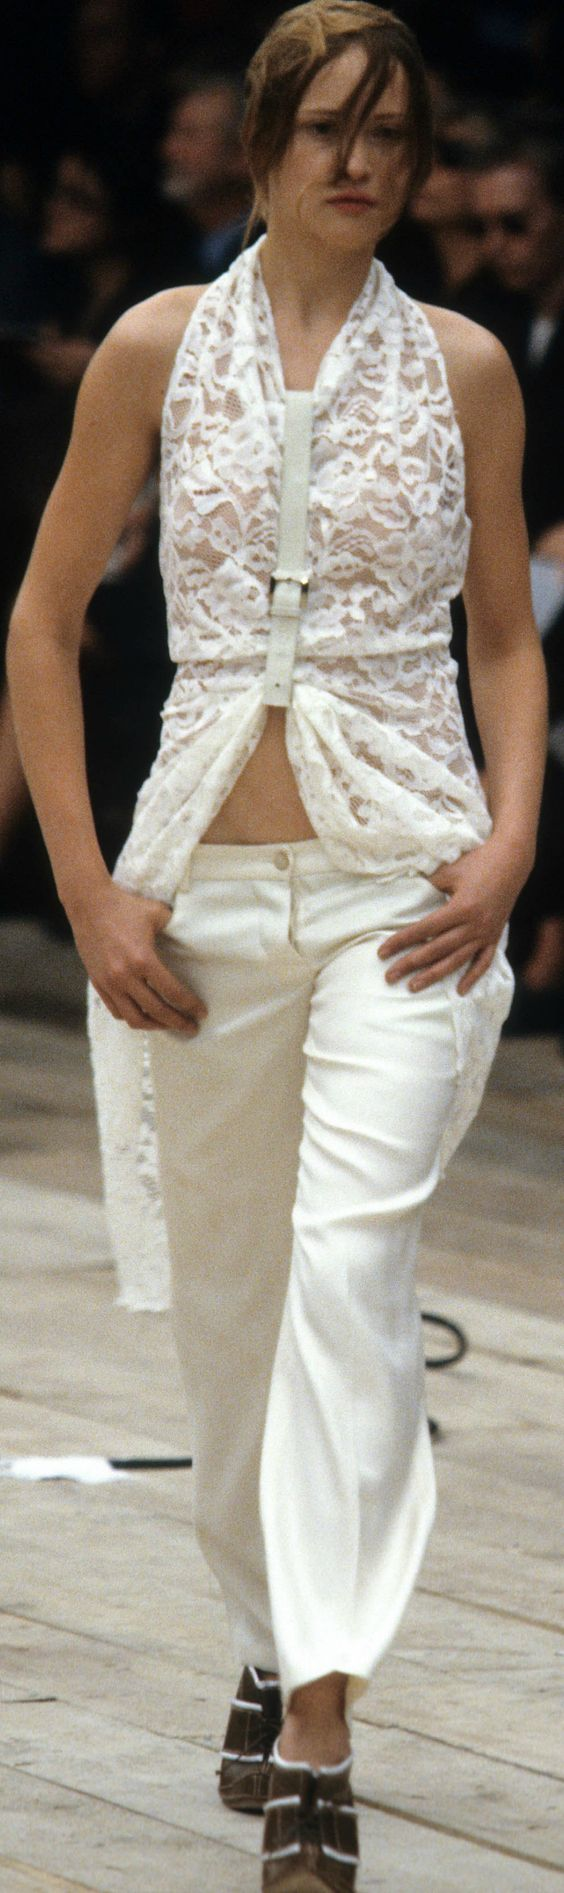 Alexander McQueen Spring 1999 Ready-to-Wear Collection